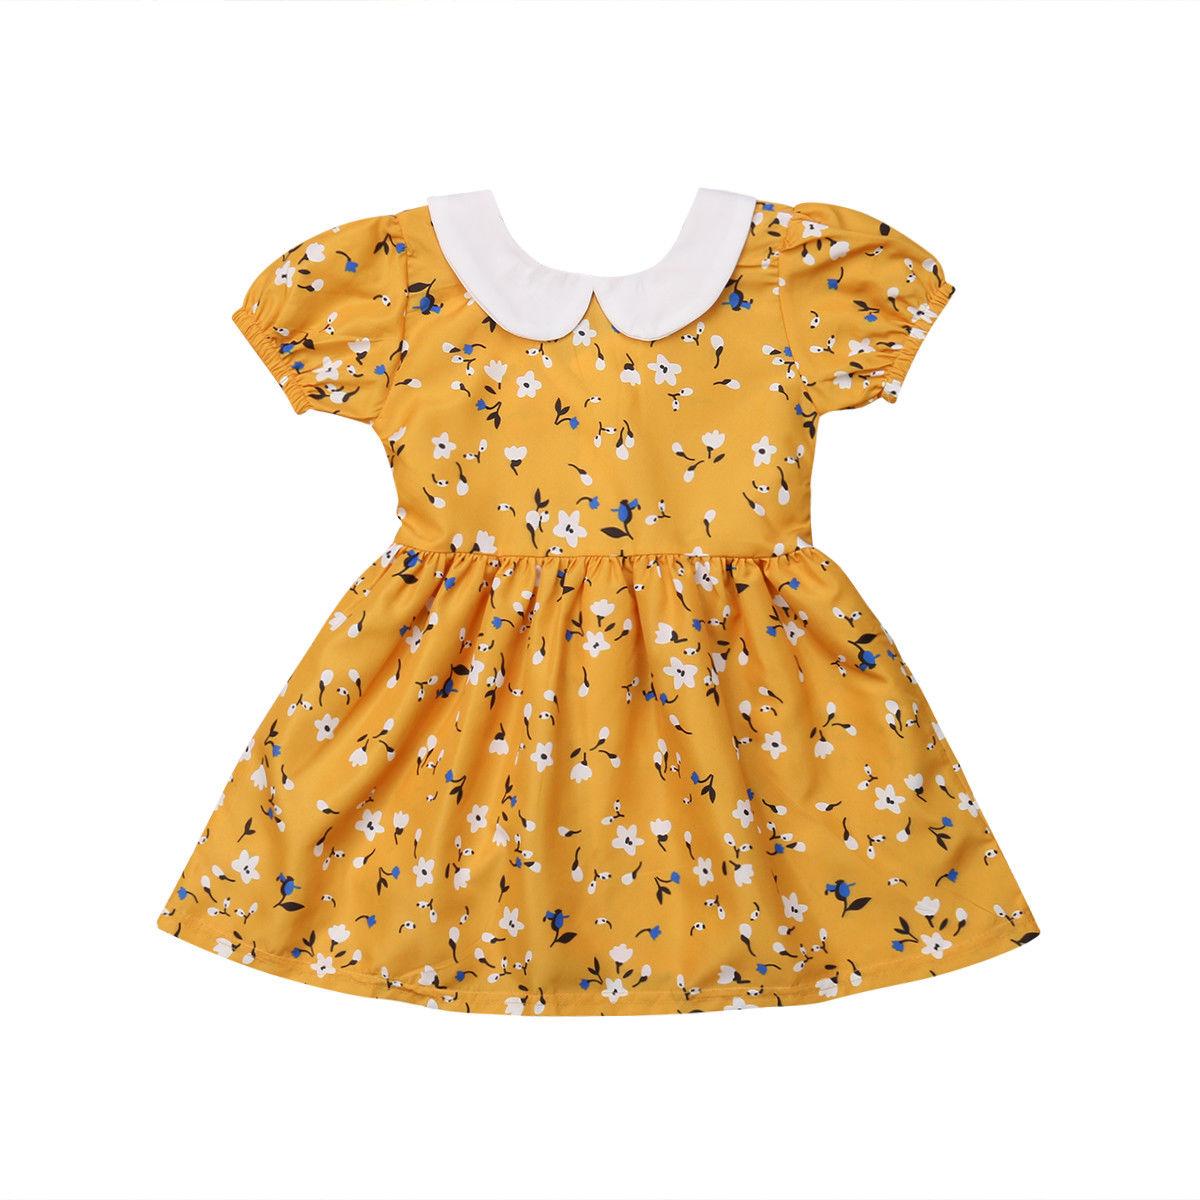 ef38de9ac Buy toddler peter pan collar dress pattern and get free shipping on  AliExpress.com